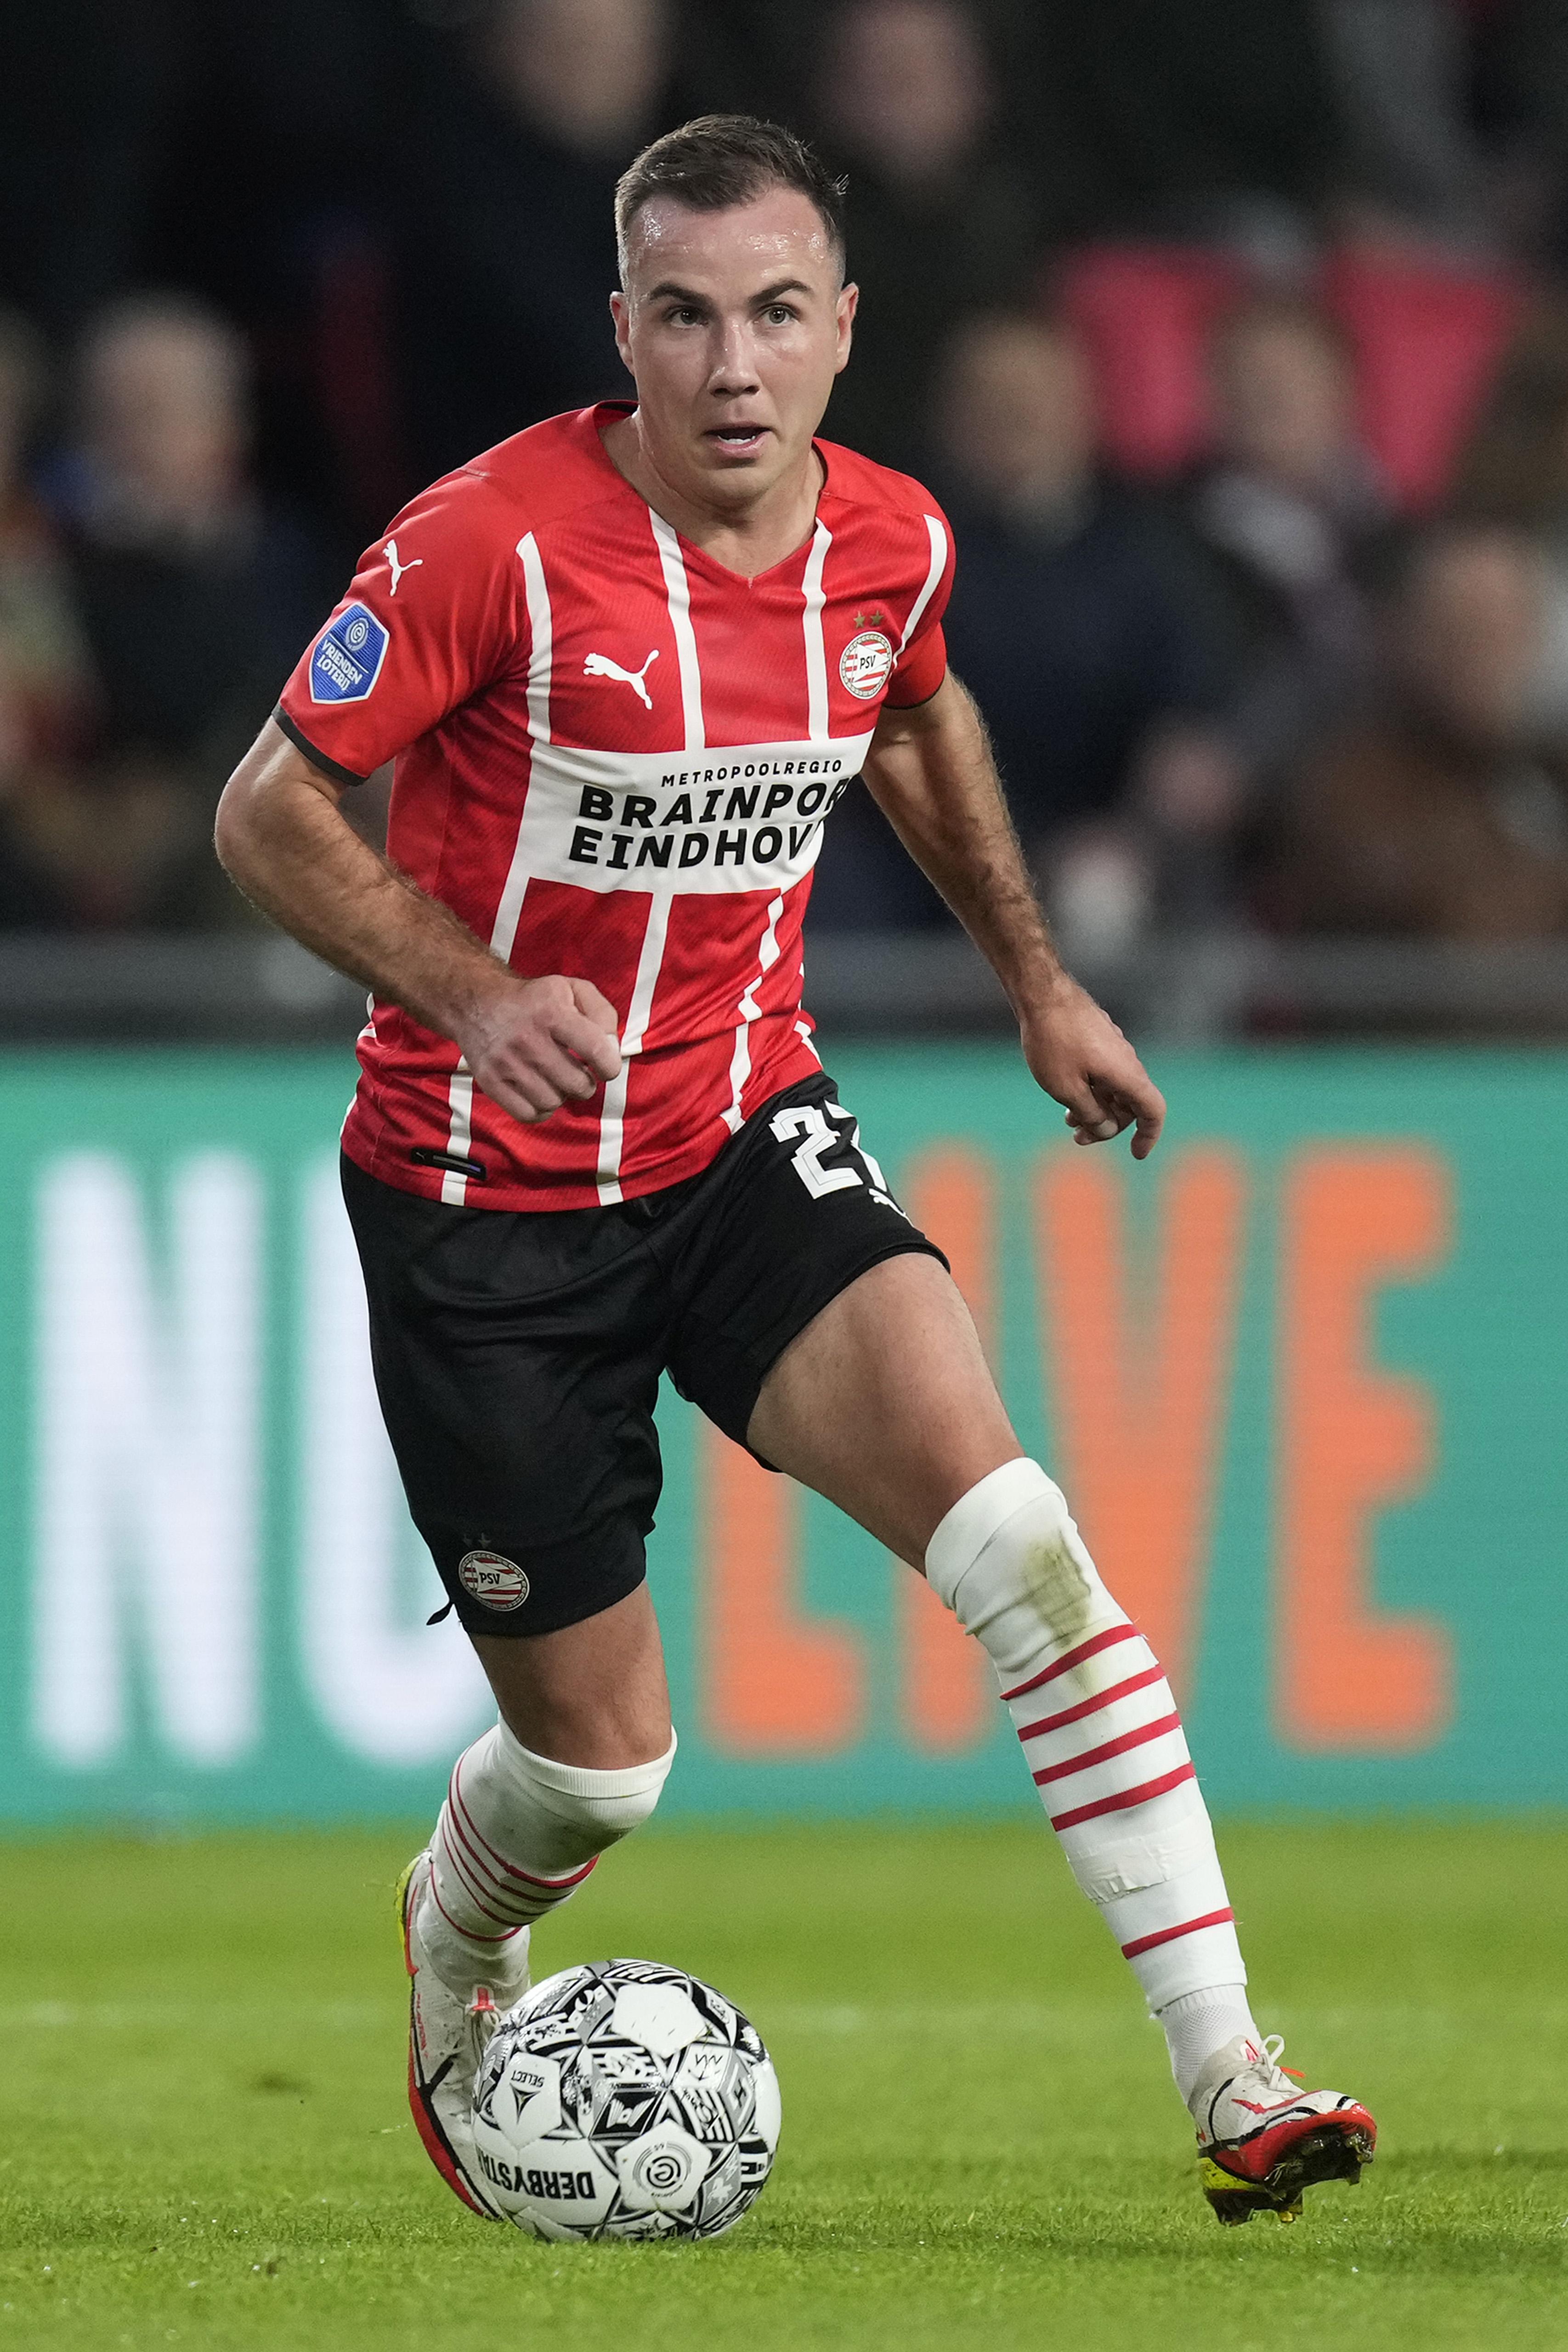 PSV v PEC Zwolle - Dutch Eredivisie